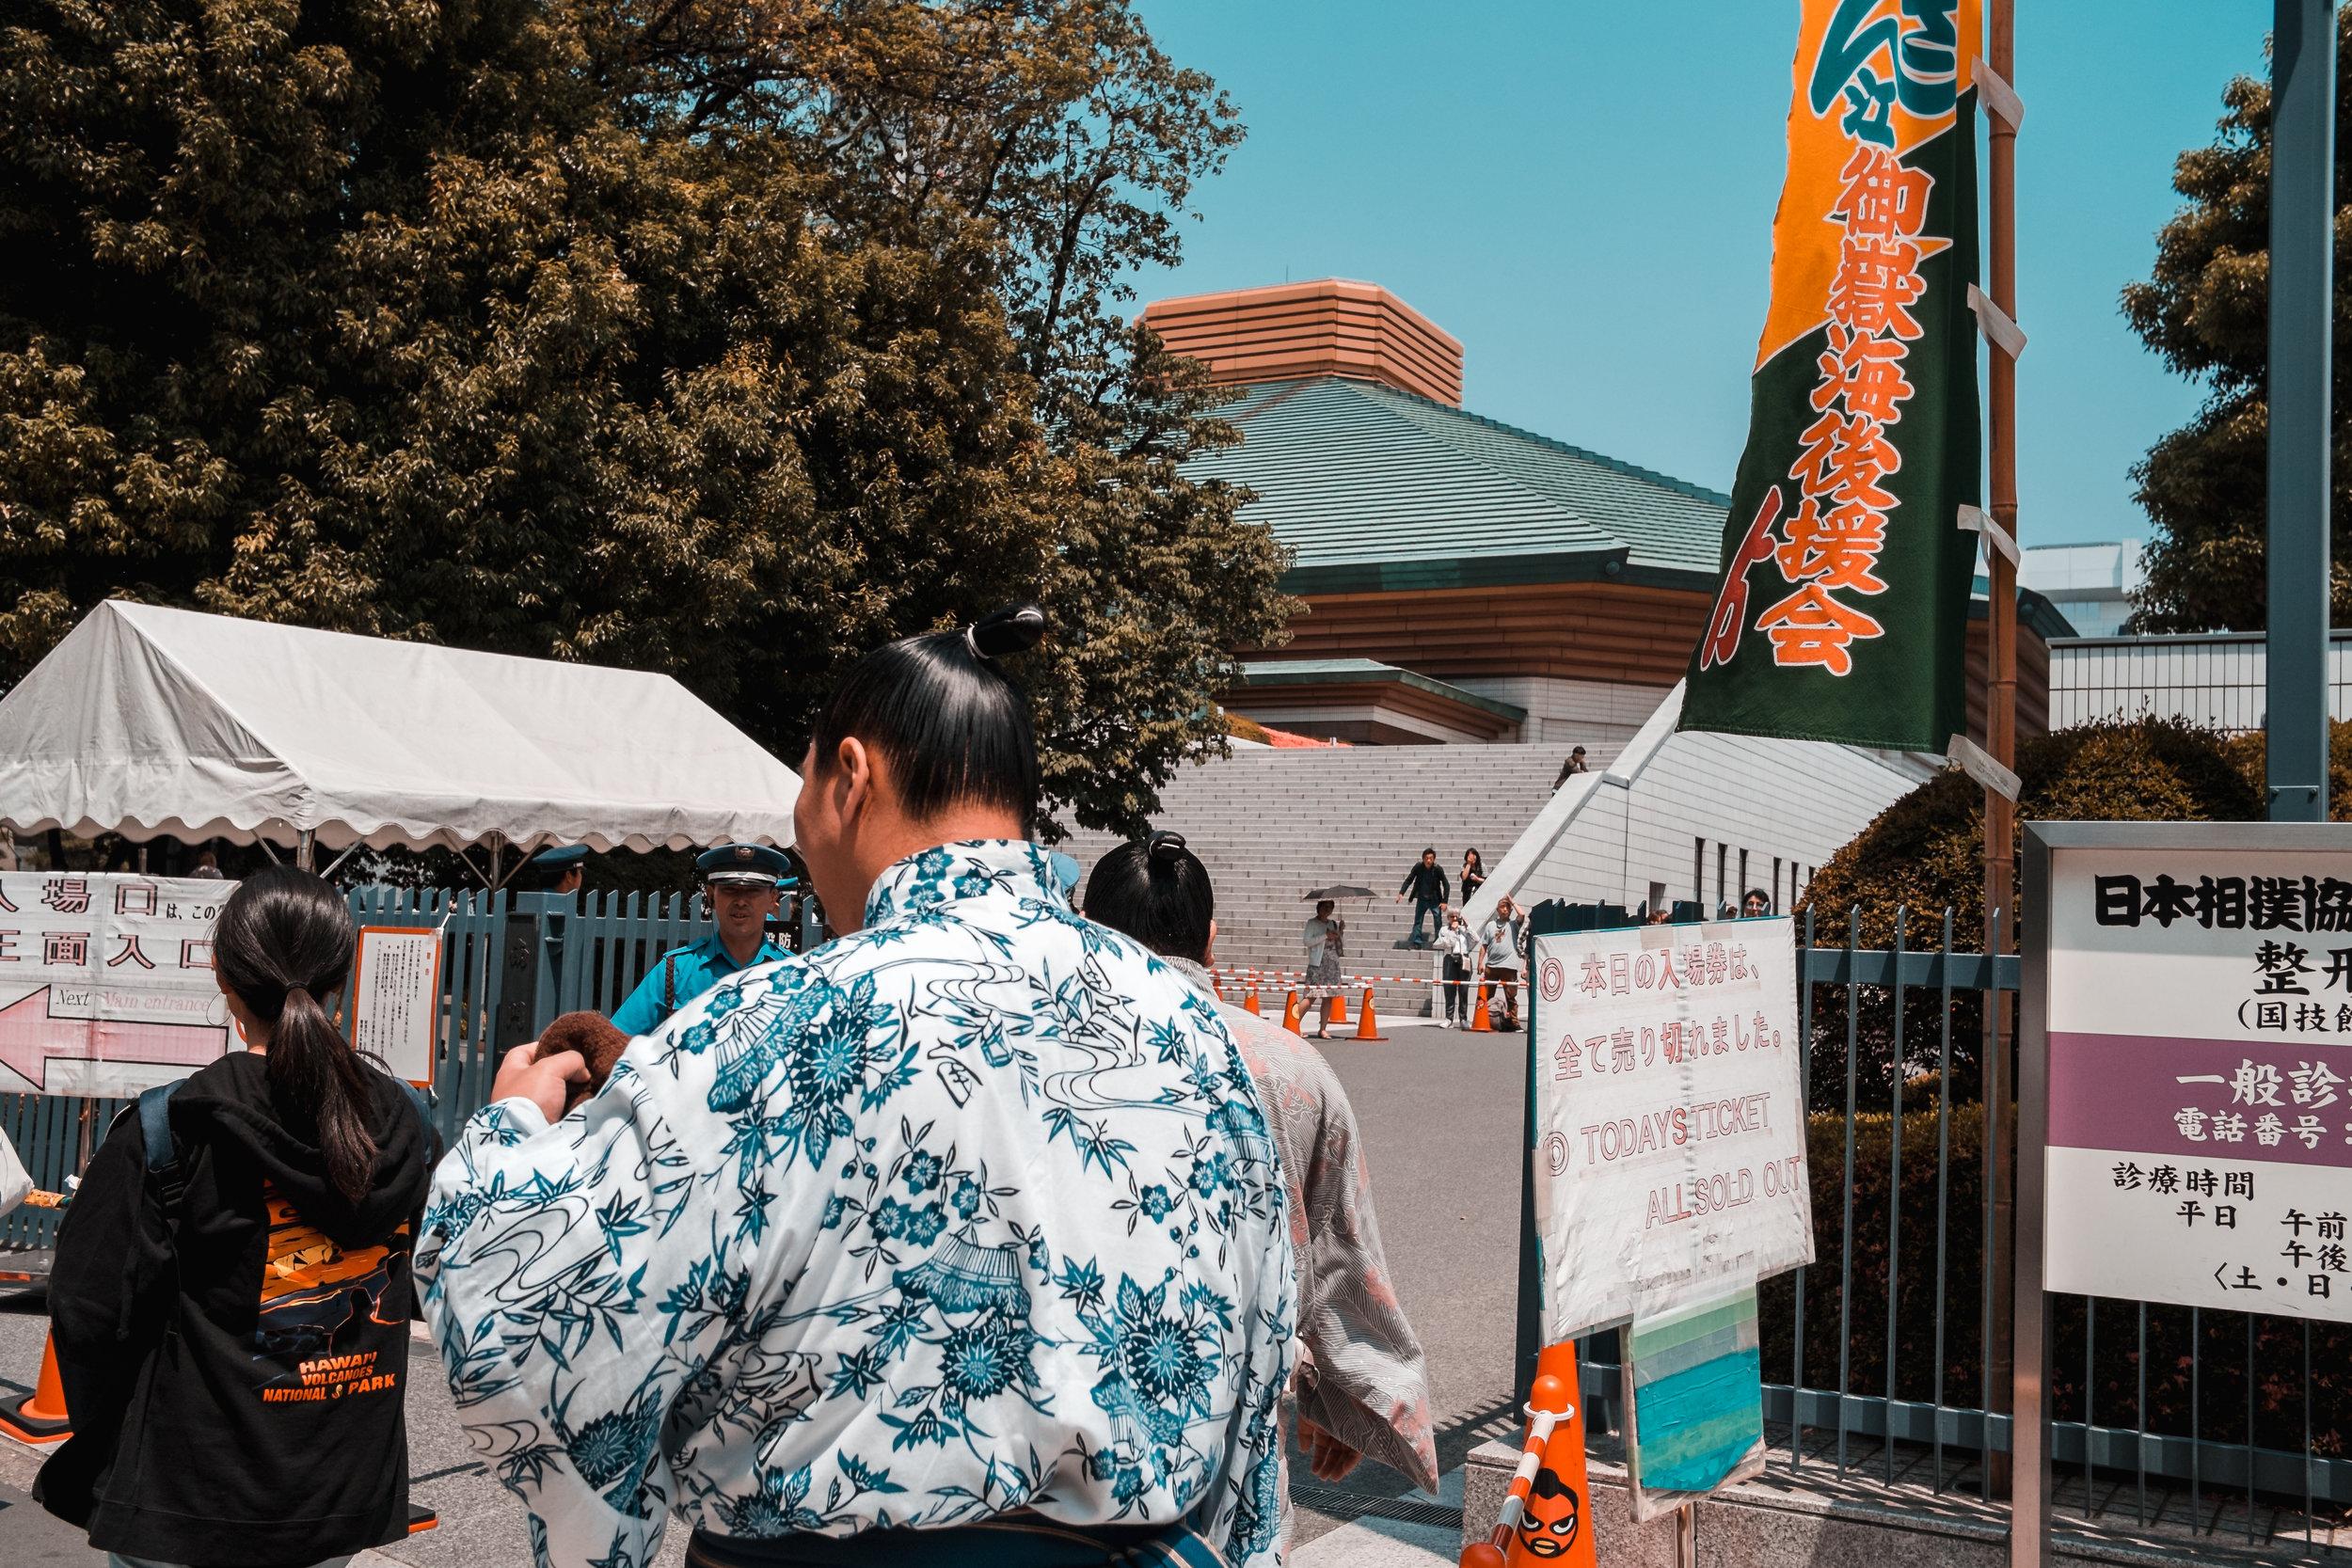 TokyoJapan_2018_AdamDillon_DSCF9381.jpg